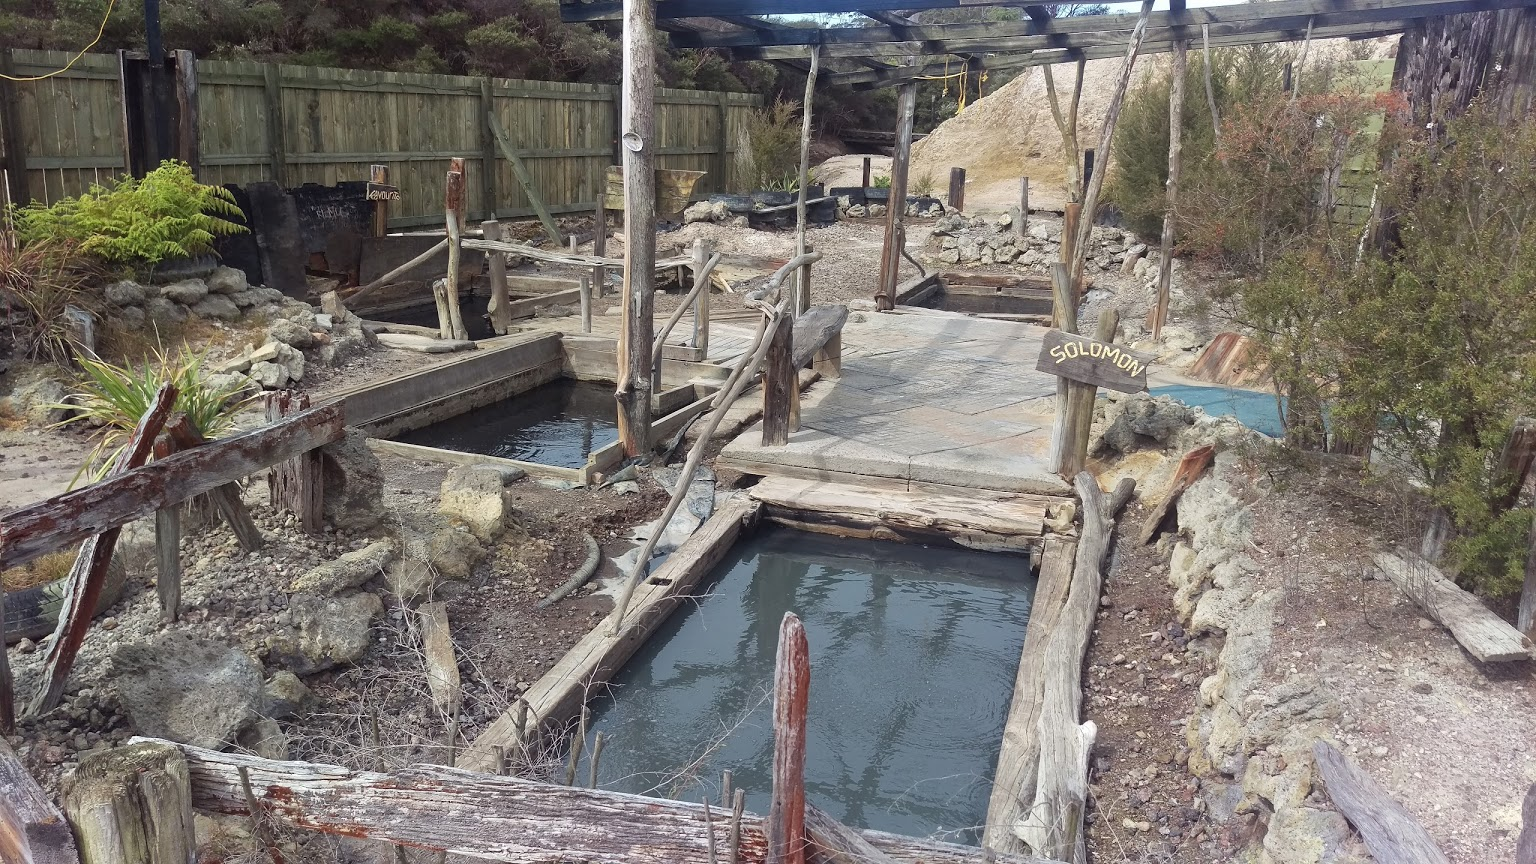 Waiariki Hot Pools - Sami jsme se nevyfotili, tak aspon pro predstavu tady je fotka ukradena z https://goo.gl/maps/59J19oGuMtt